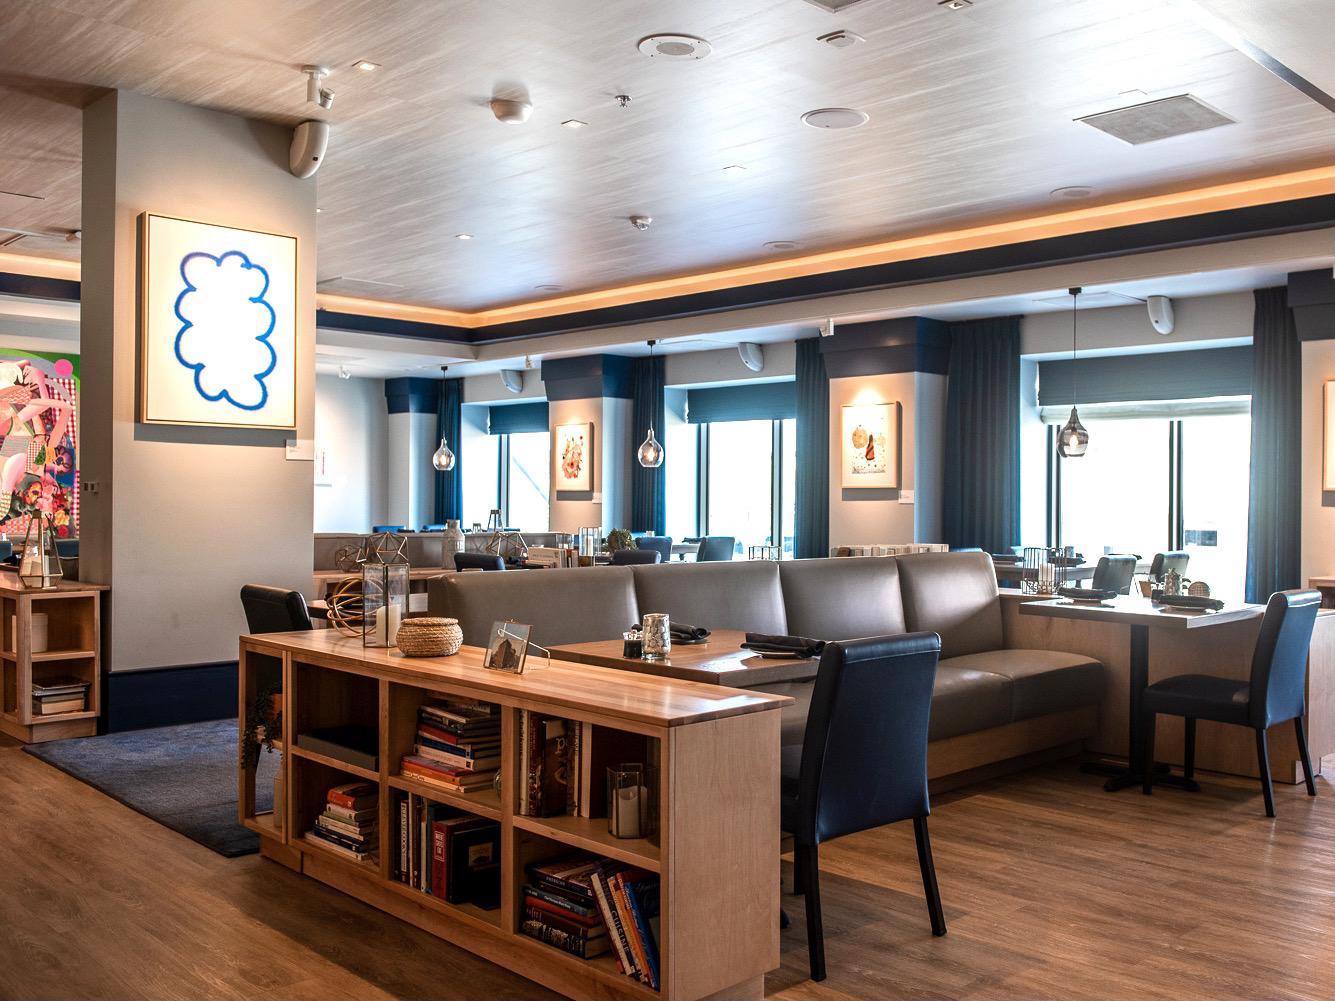 ARIA dining room